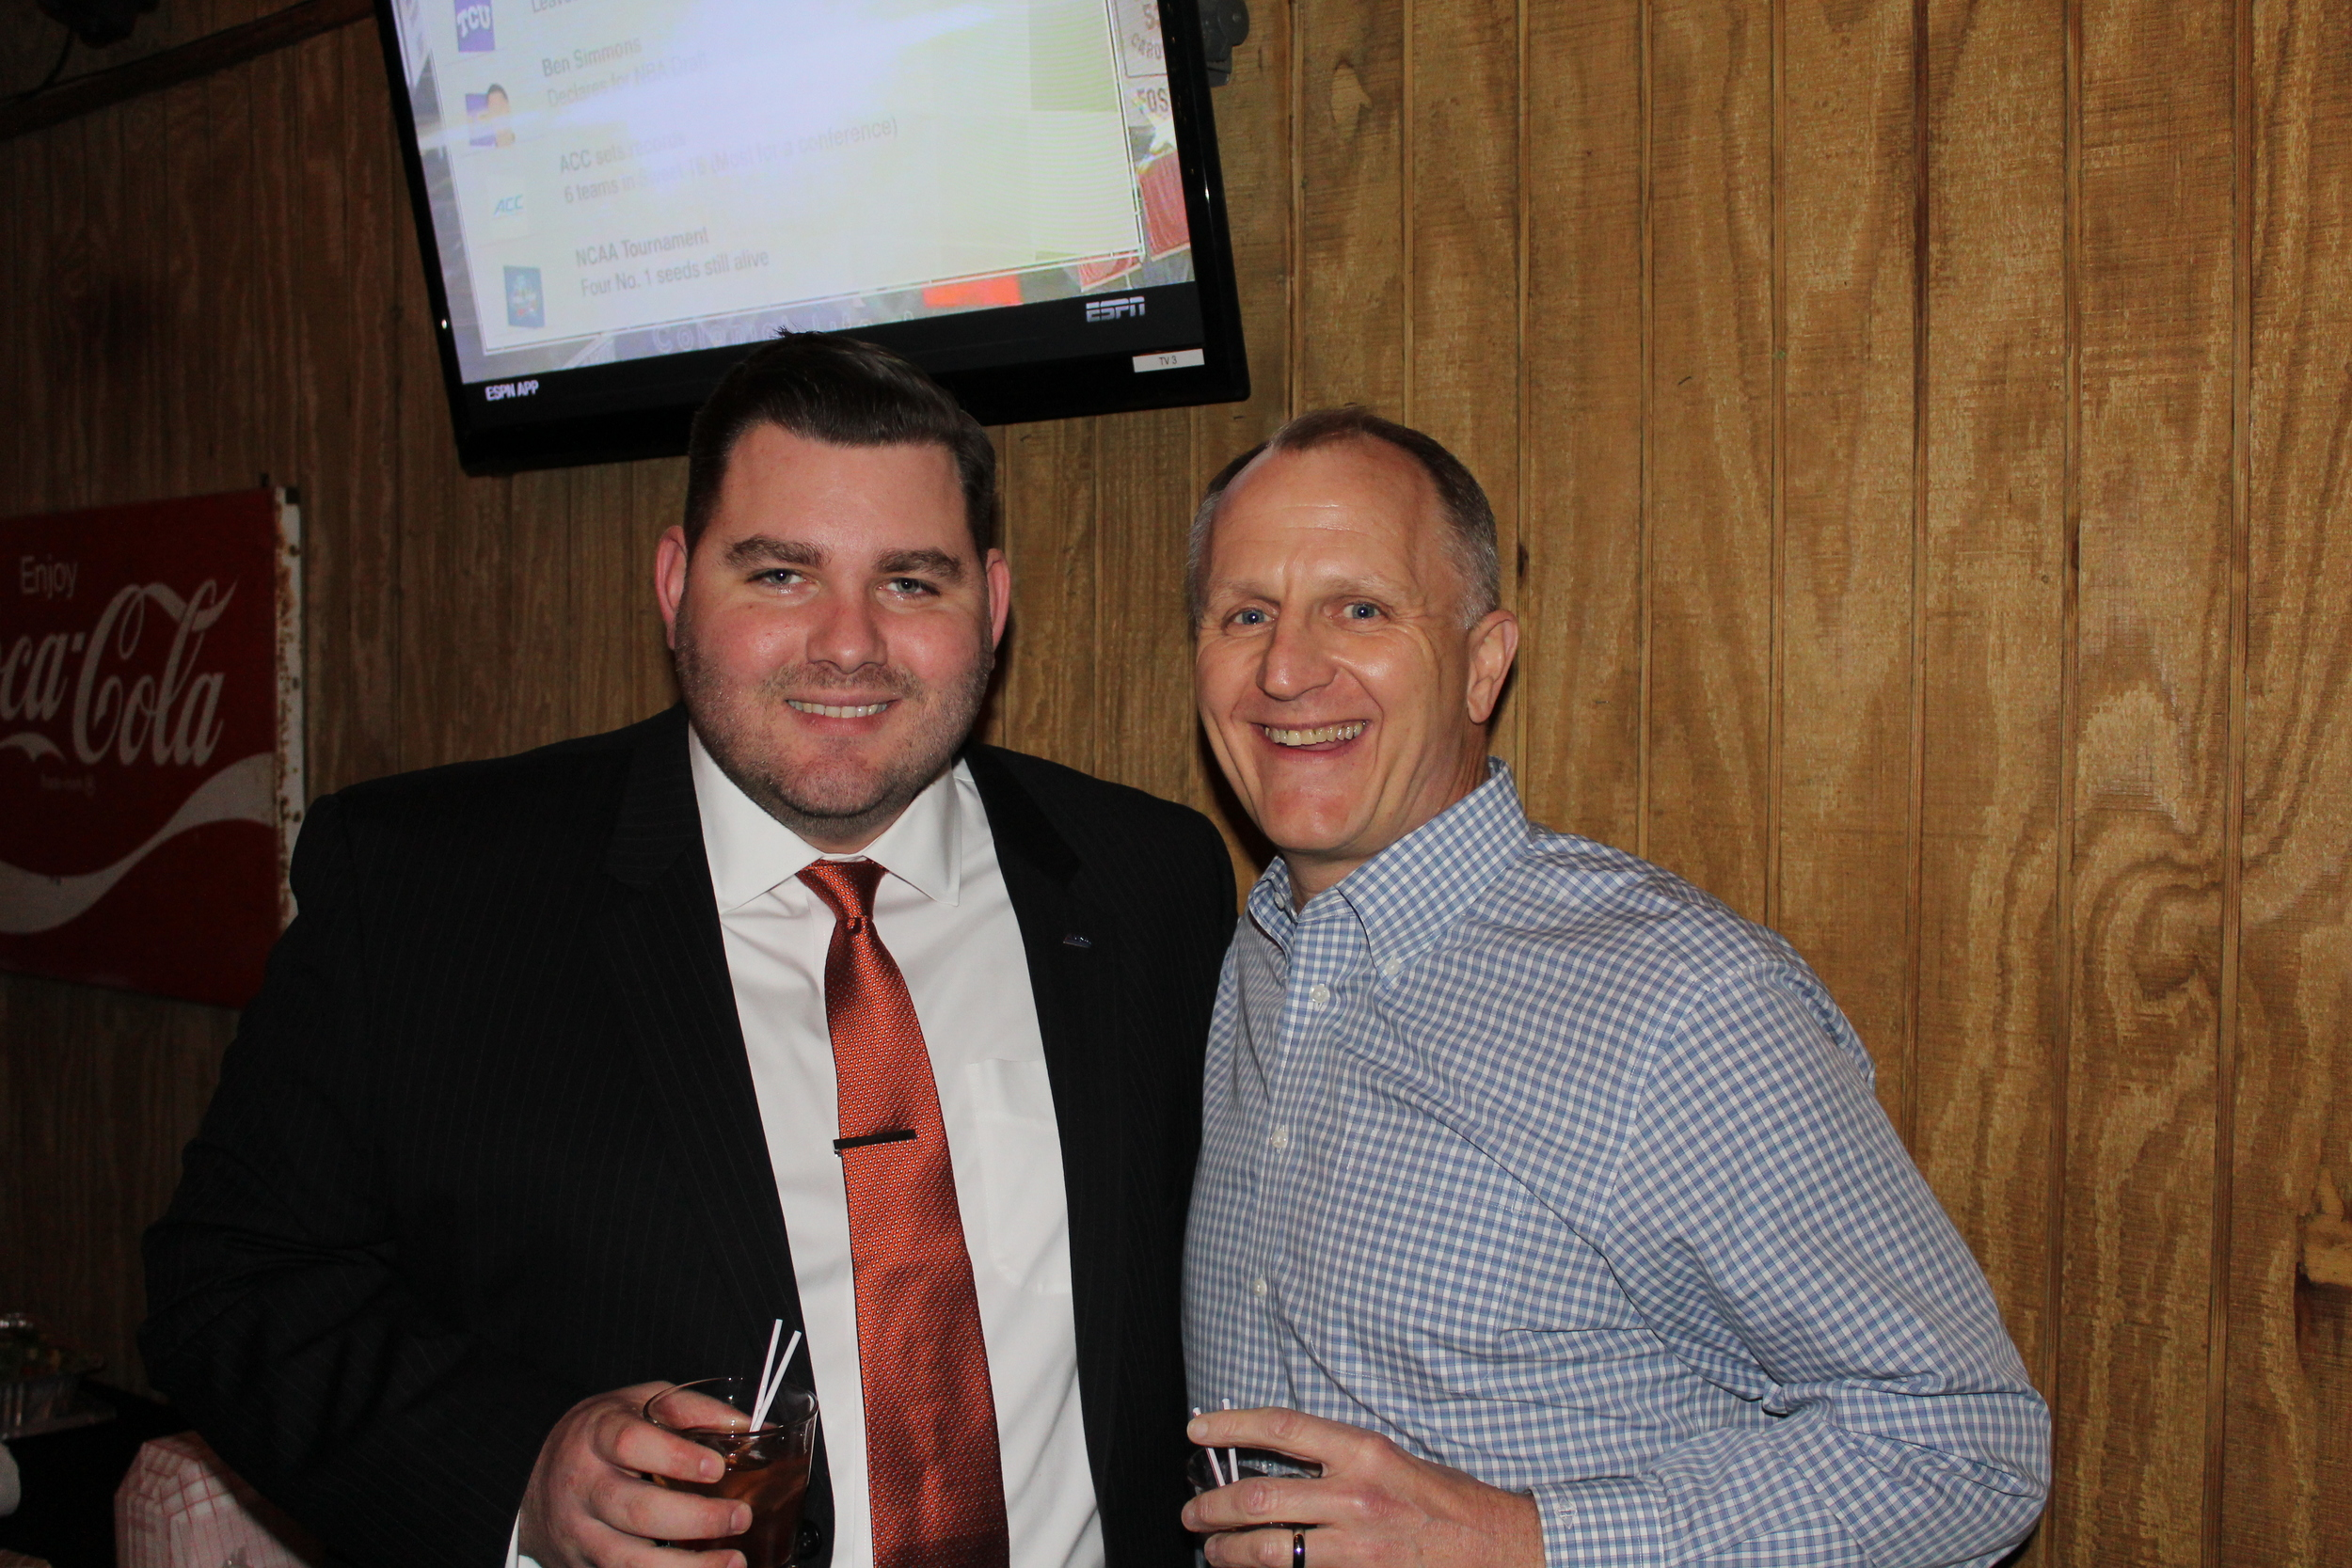 Forward Relocation's Ben Cross at Updater's Crawfish Boil with EWS Group's Allan Lamar